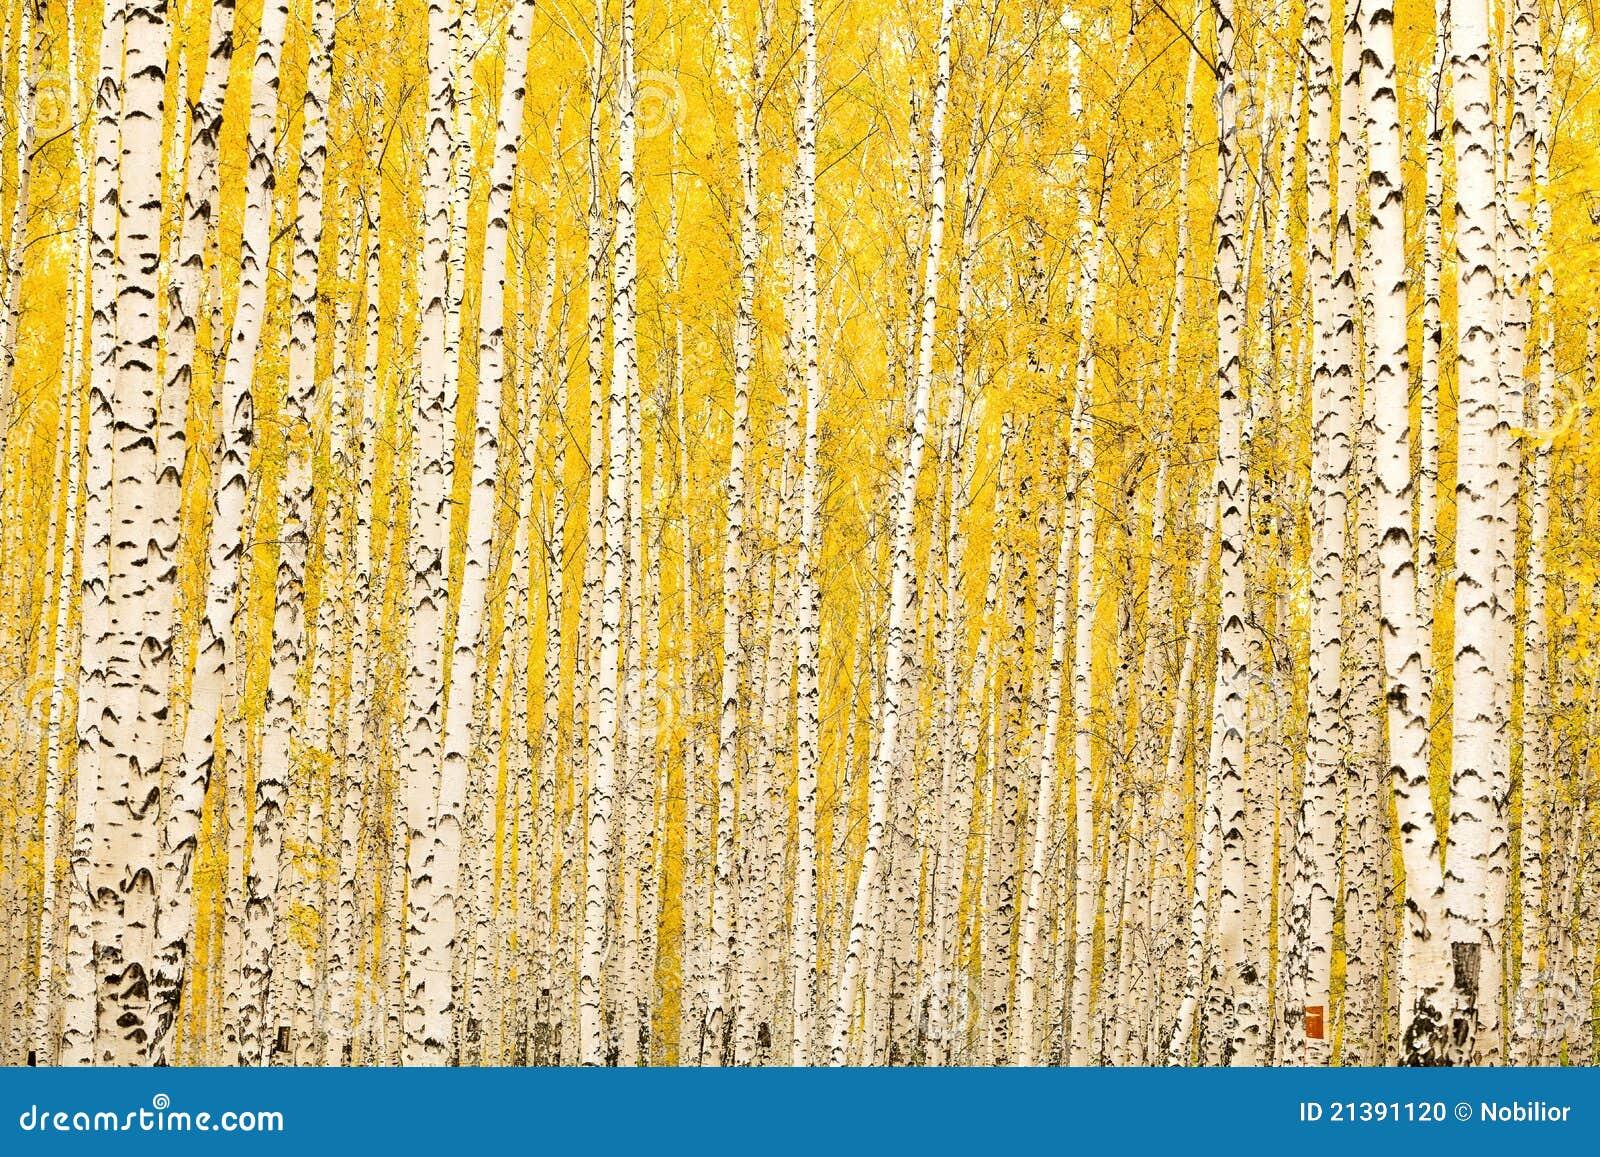 Herbstbirkenwald